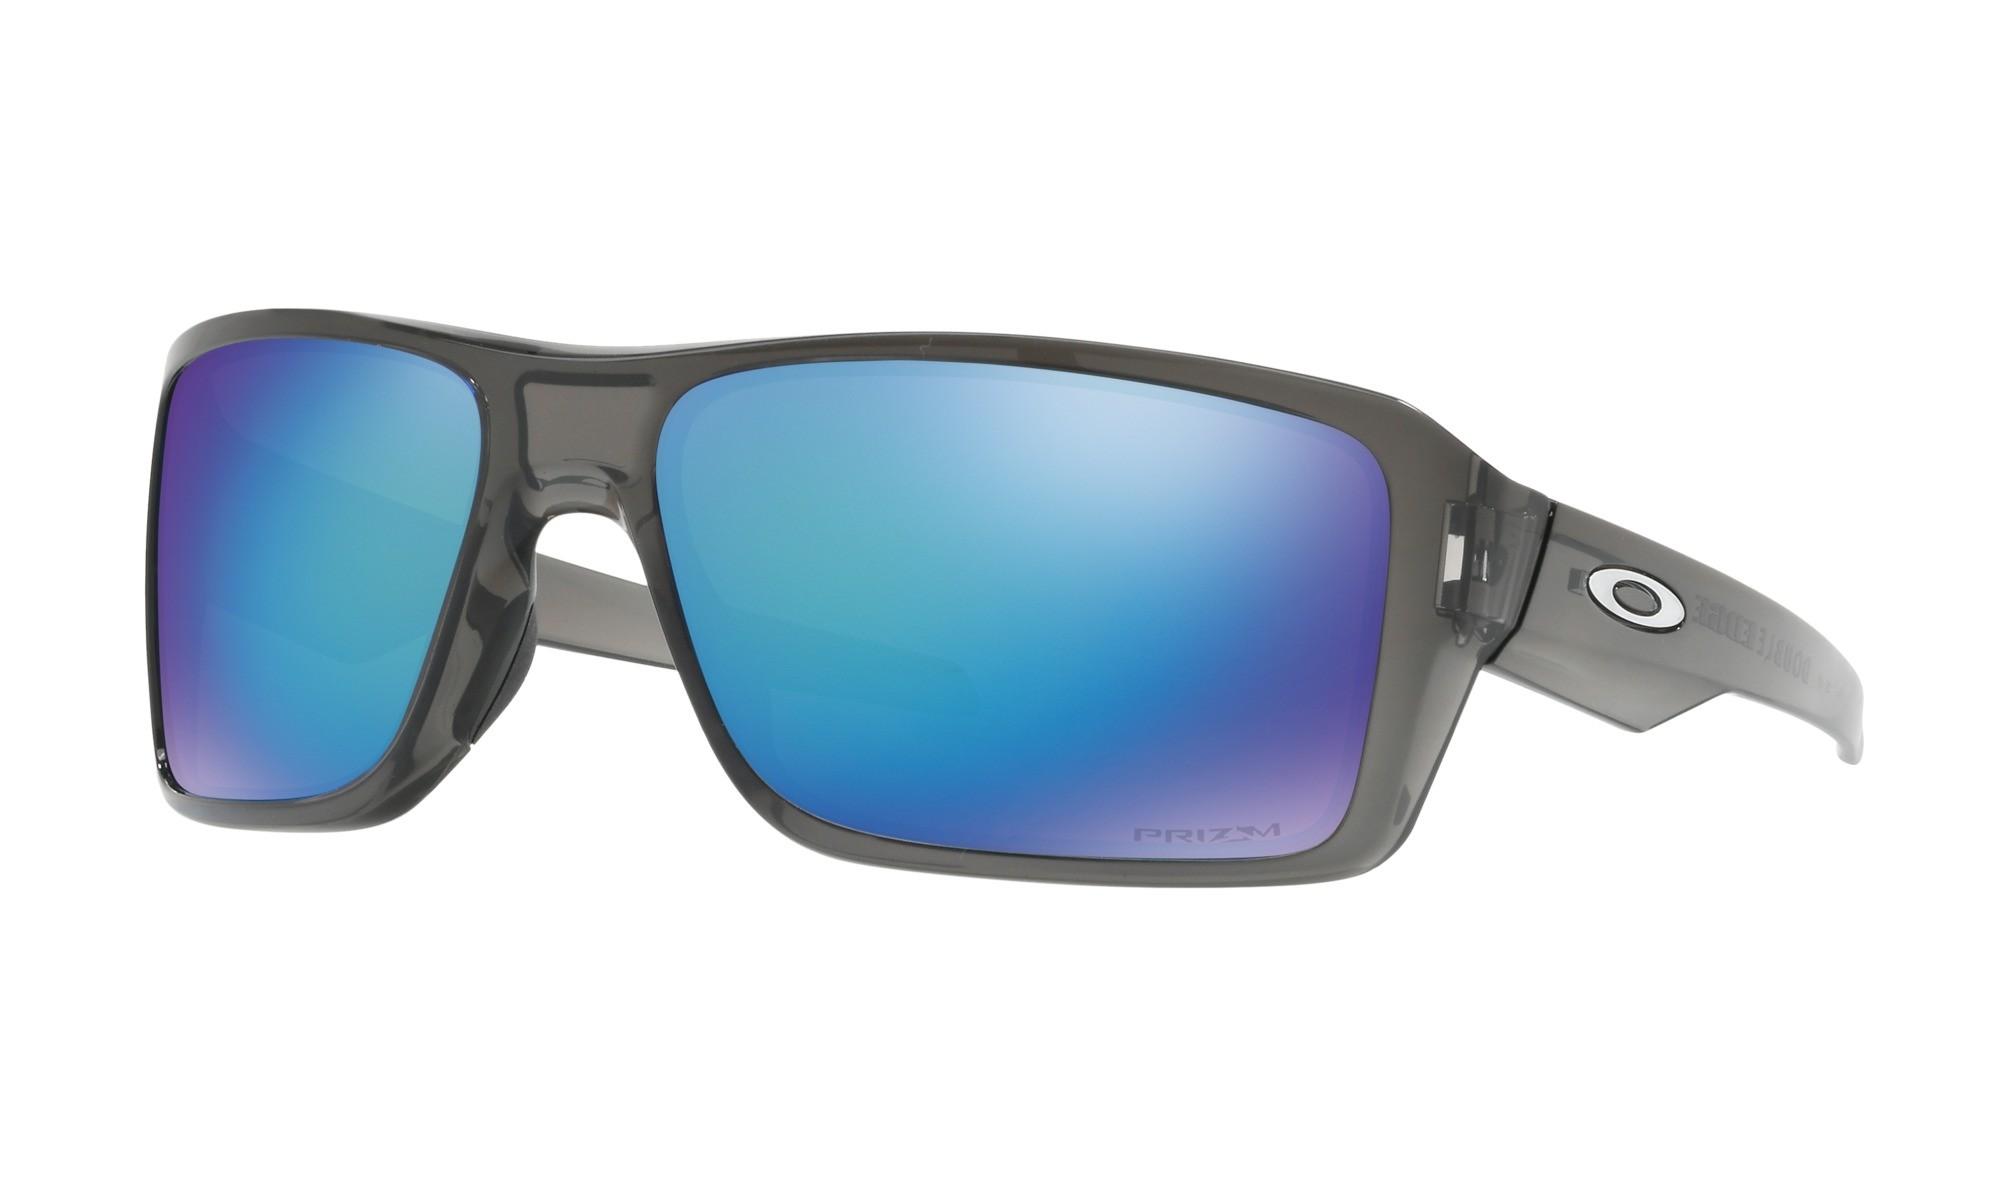 87c73681a1 Oakley Double Edge Gray Smoke Prizm Sapphire Polarized Sunglasses